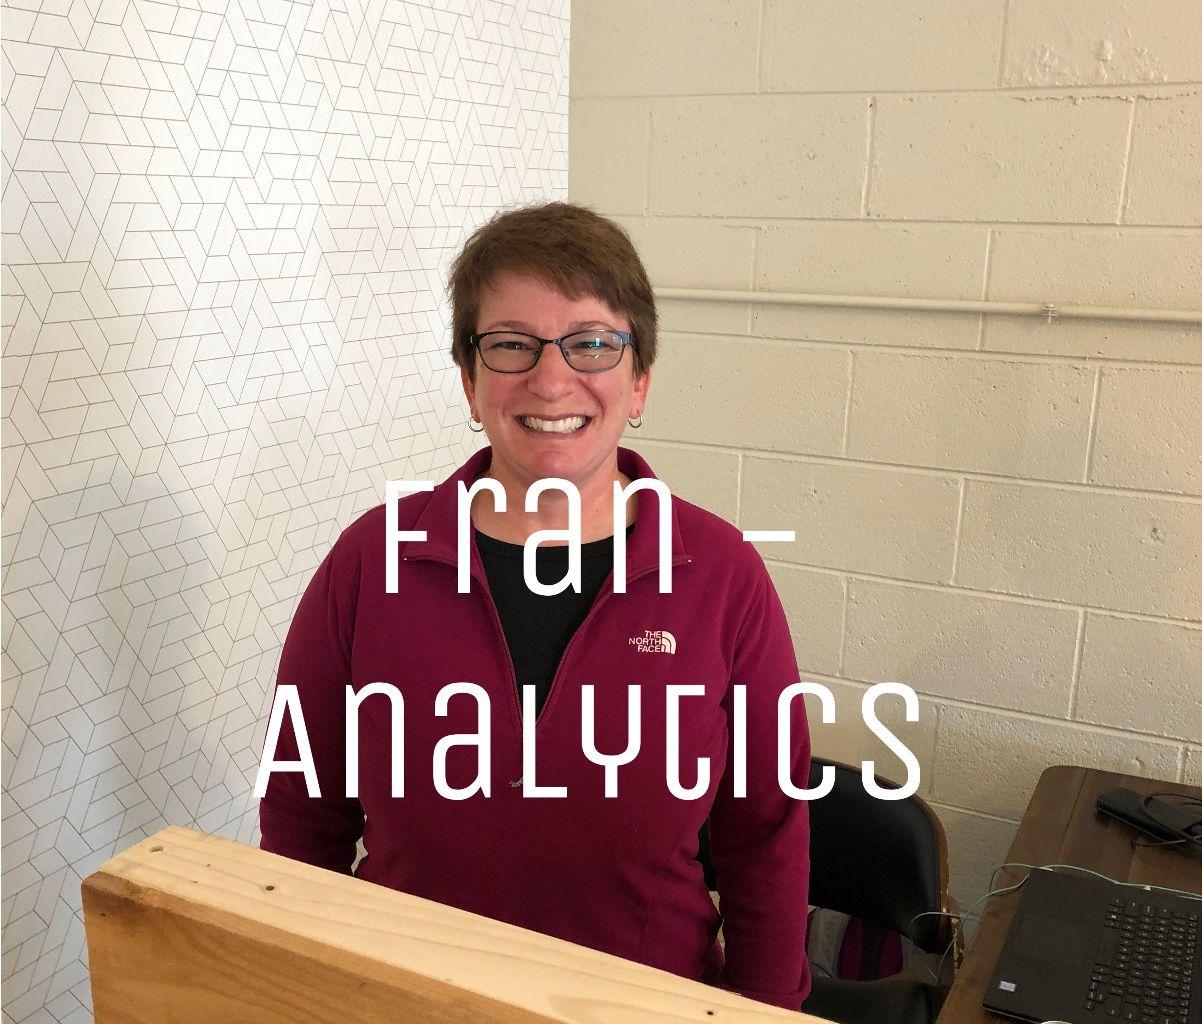 Fran_Analytics.jpg